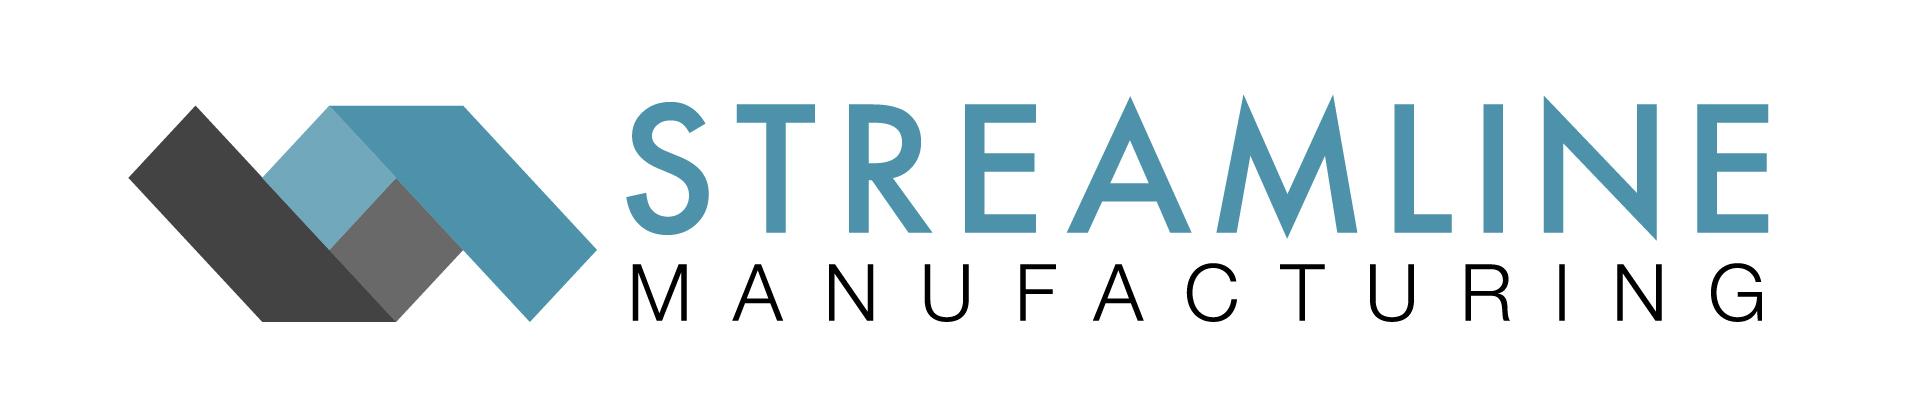 Streamline Manufacturing Logo